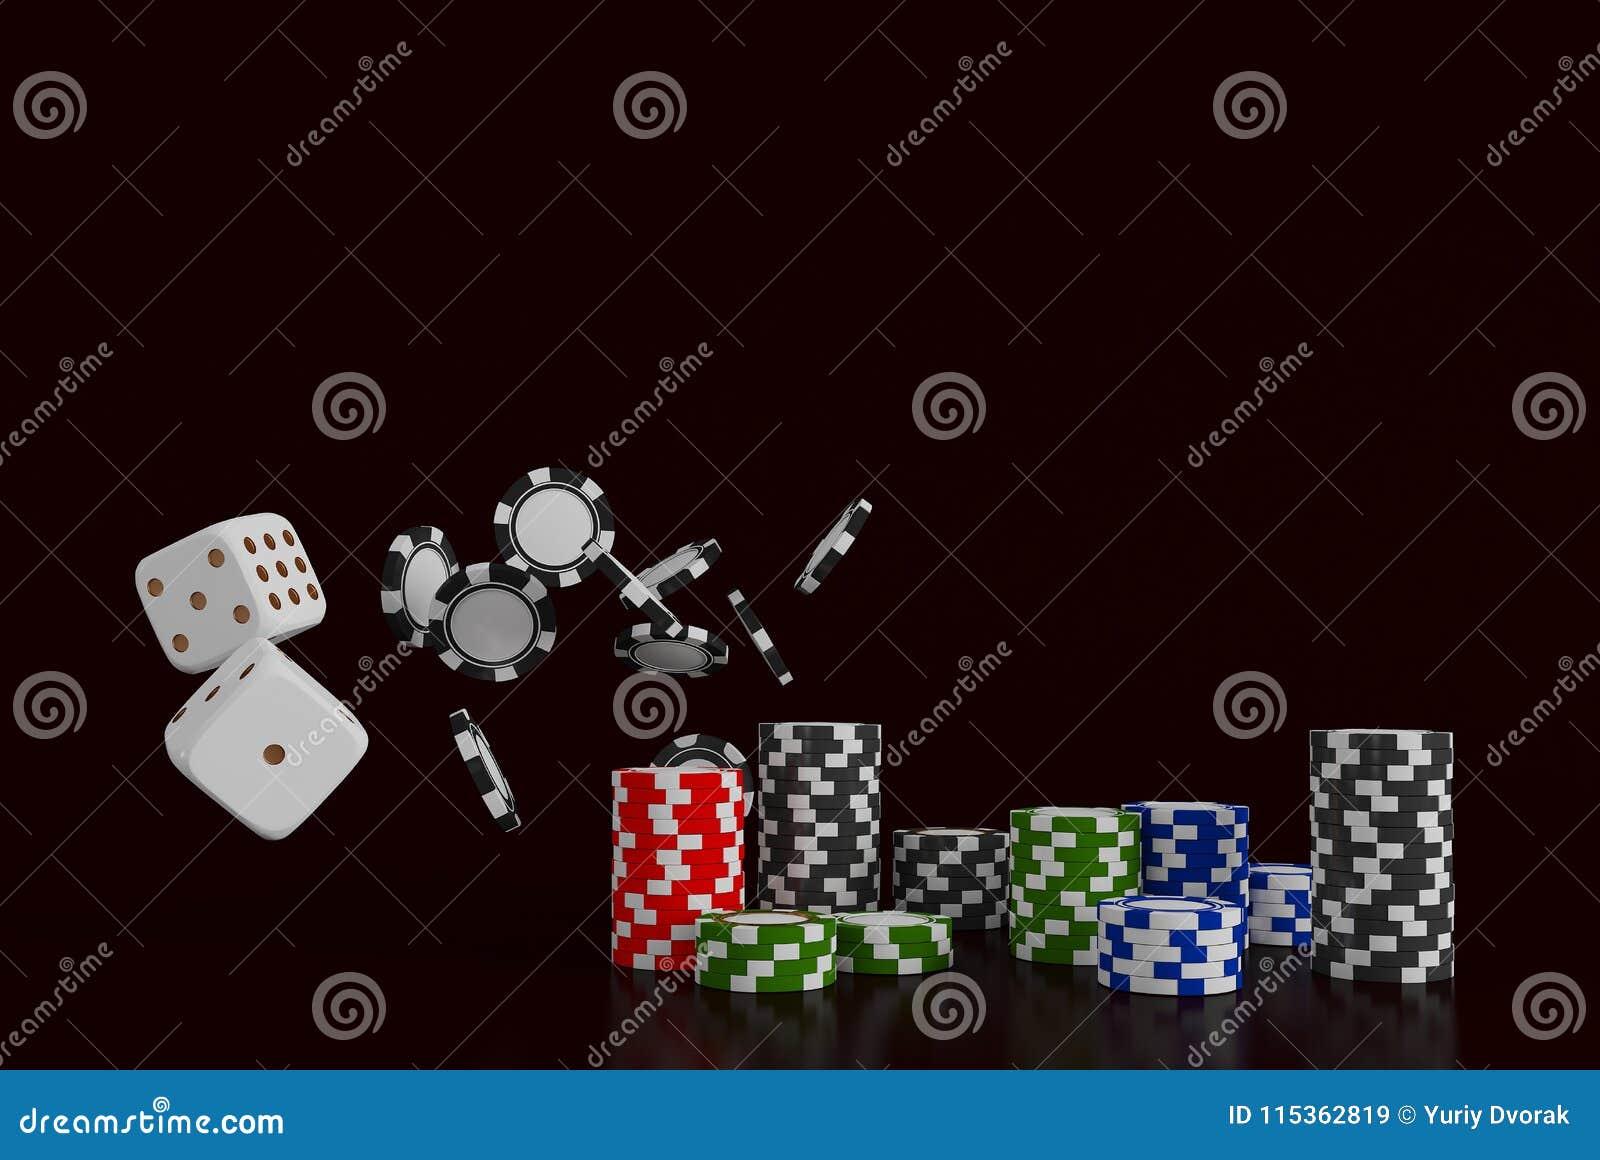 novomatic online casino real money